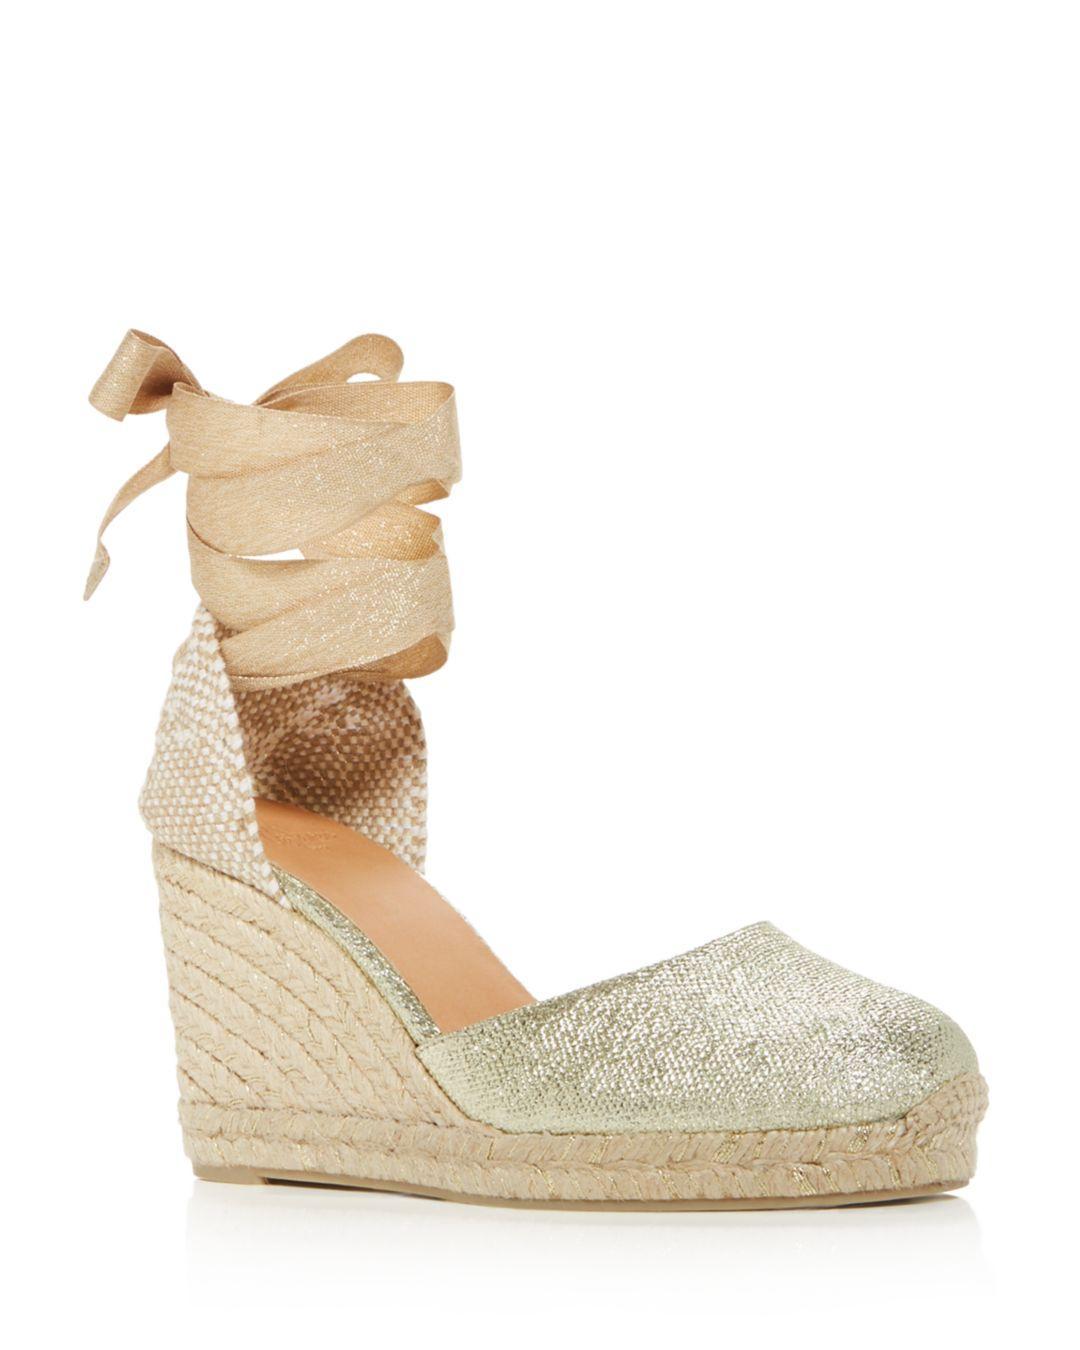 5853d632d80 Castaner Women's Carina Platform Wedge Espadrille Sandals - Lyst